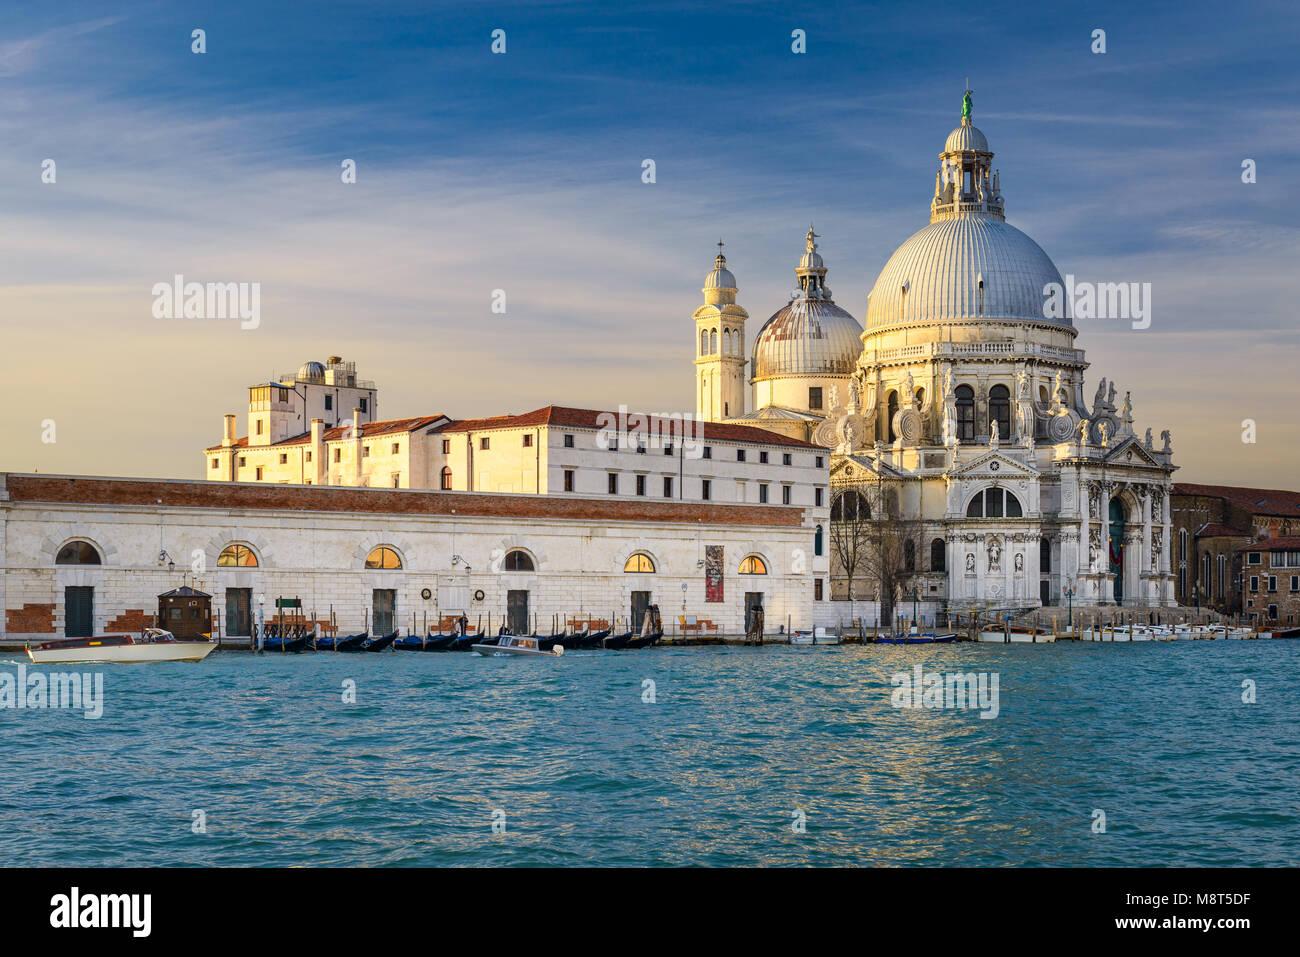 Grand Canal avec Basilique Santa Maria della Salute à Venise, Italie Banque D'Images